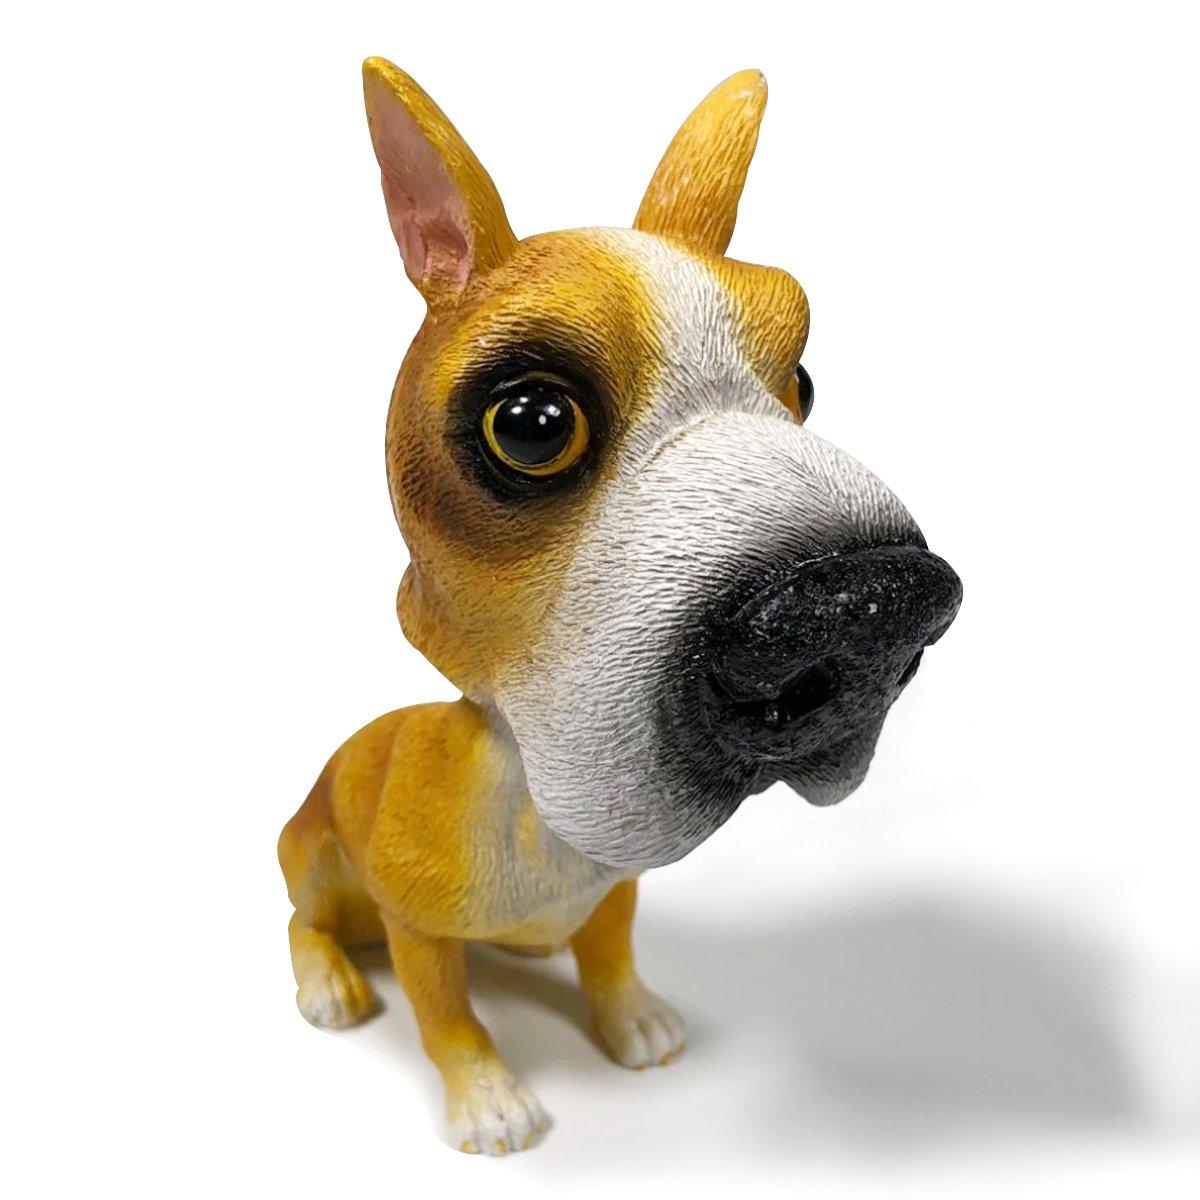 COGEEK Bobble Head Dogs Bobbing Heads Car Dash Puppy Car decoration Dachshund